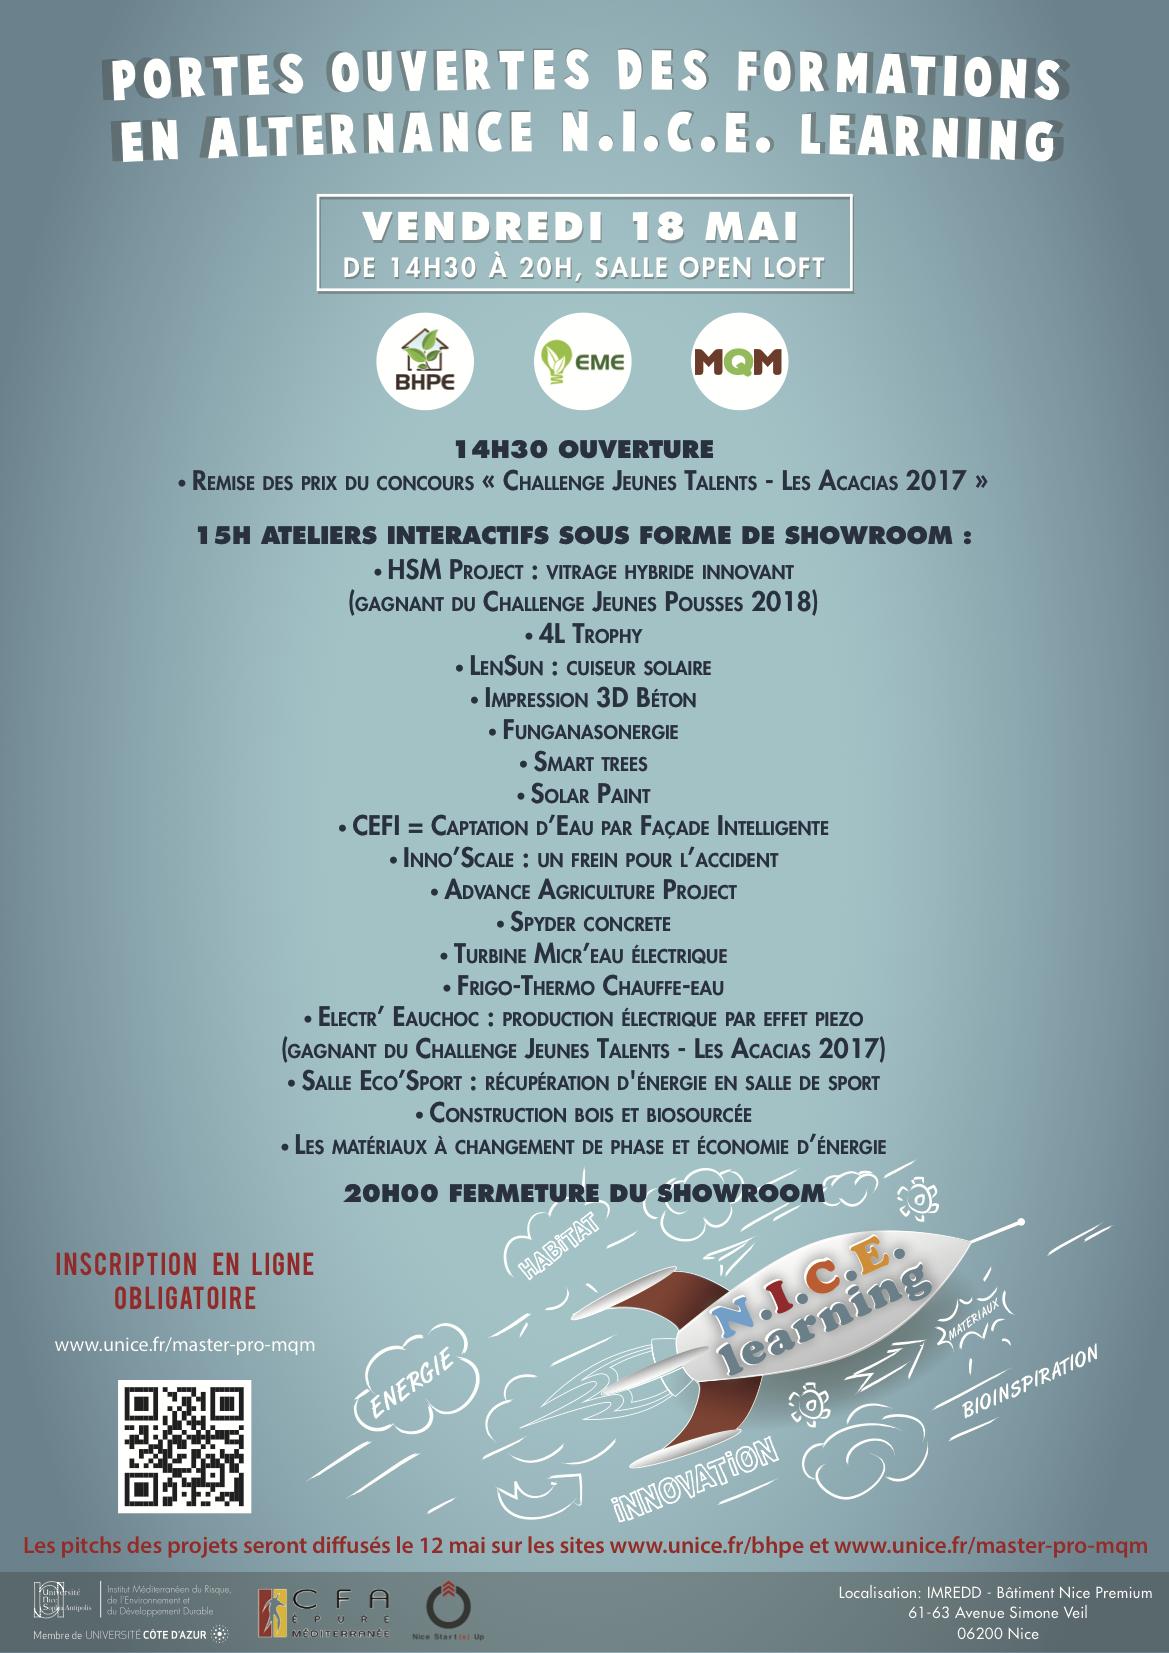 programme-portes-ouvertes-mai-2018